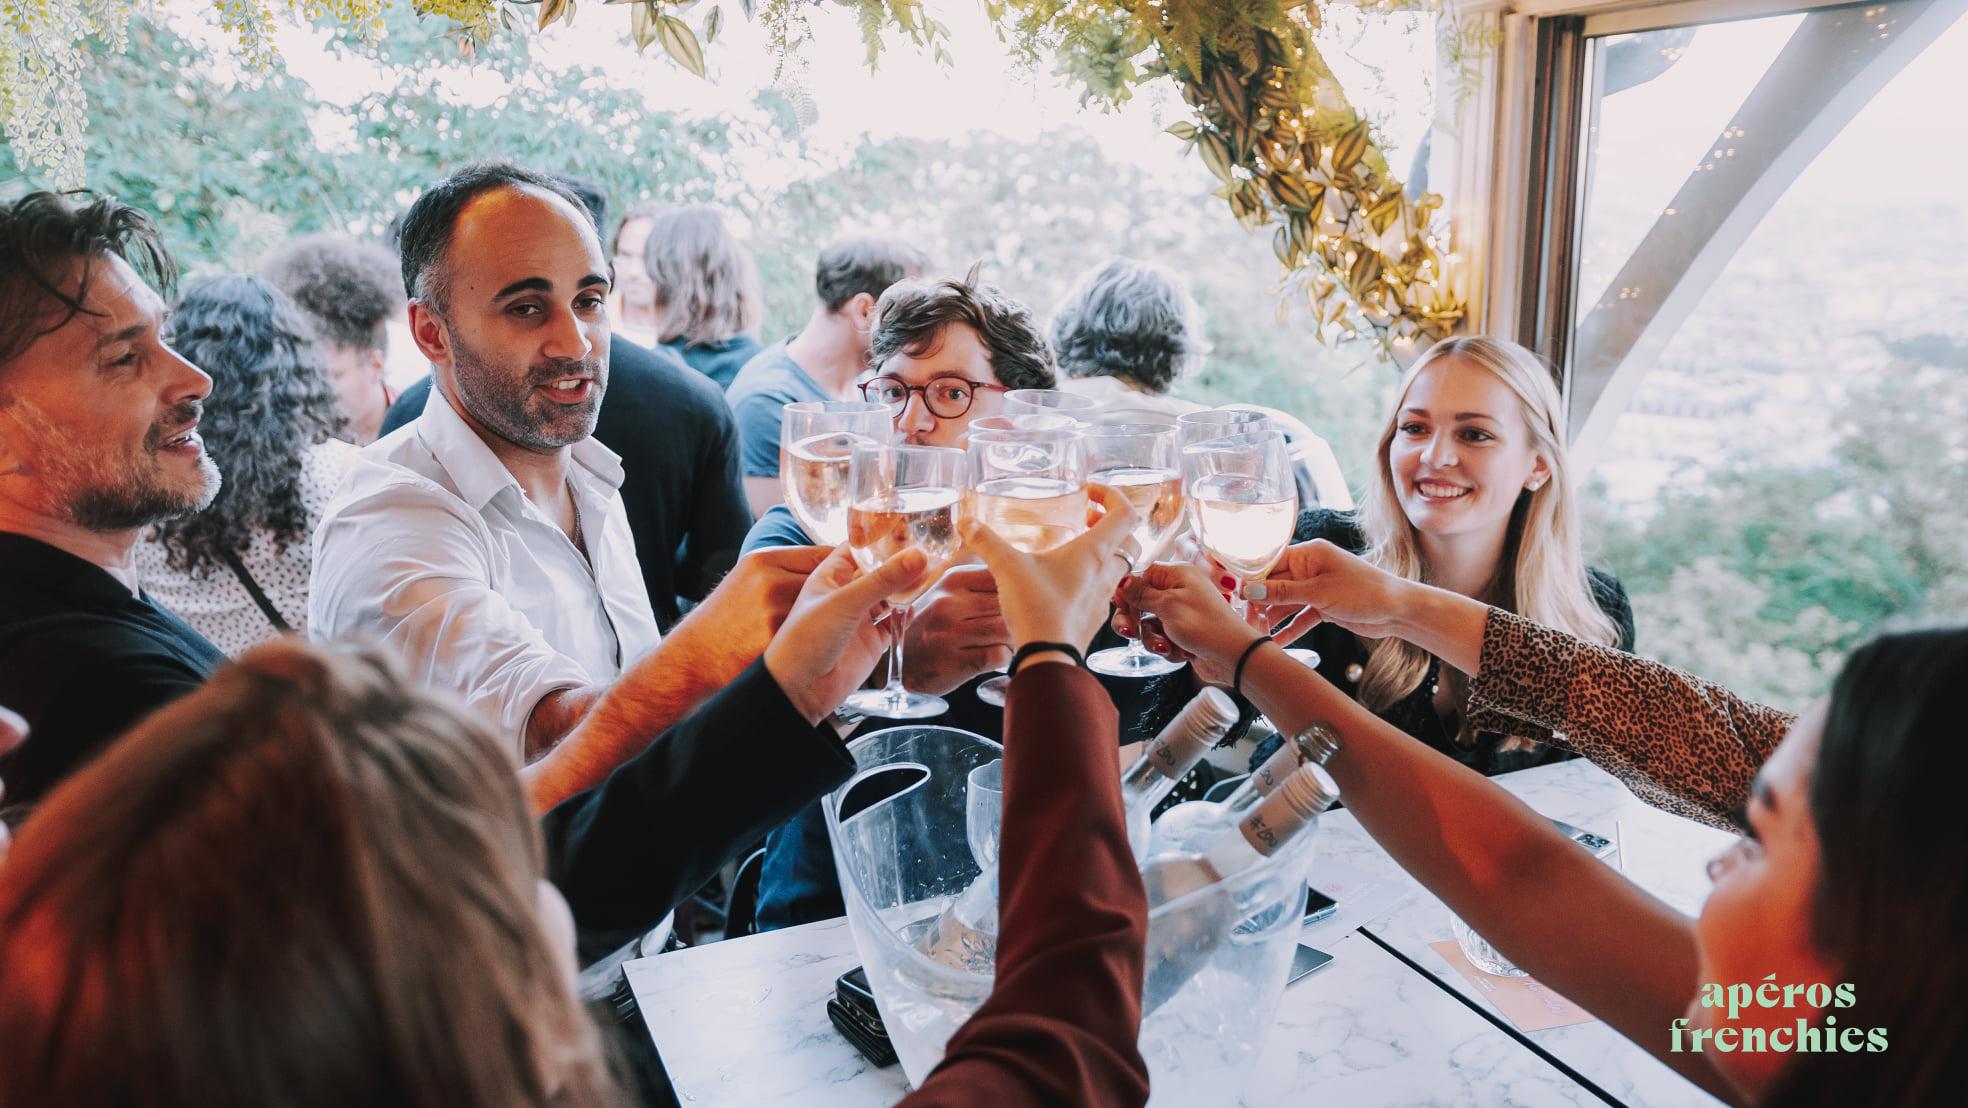 coeur-sacre-aperos-frenchies-wine